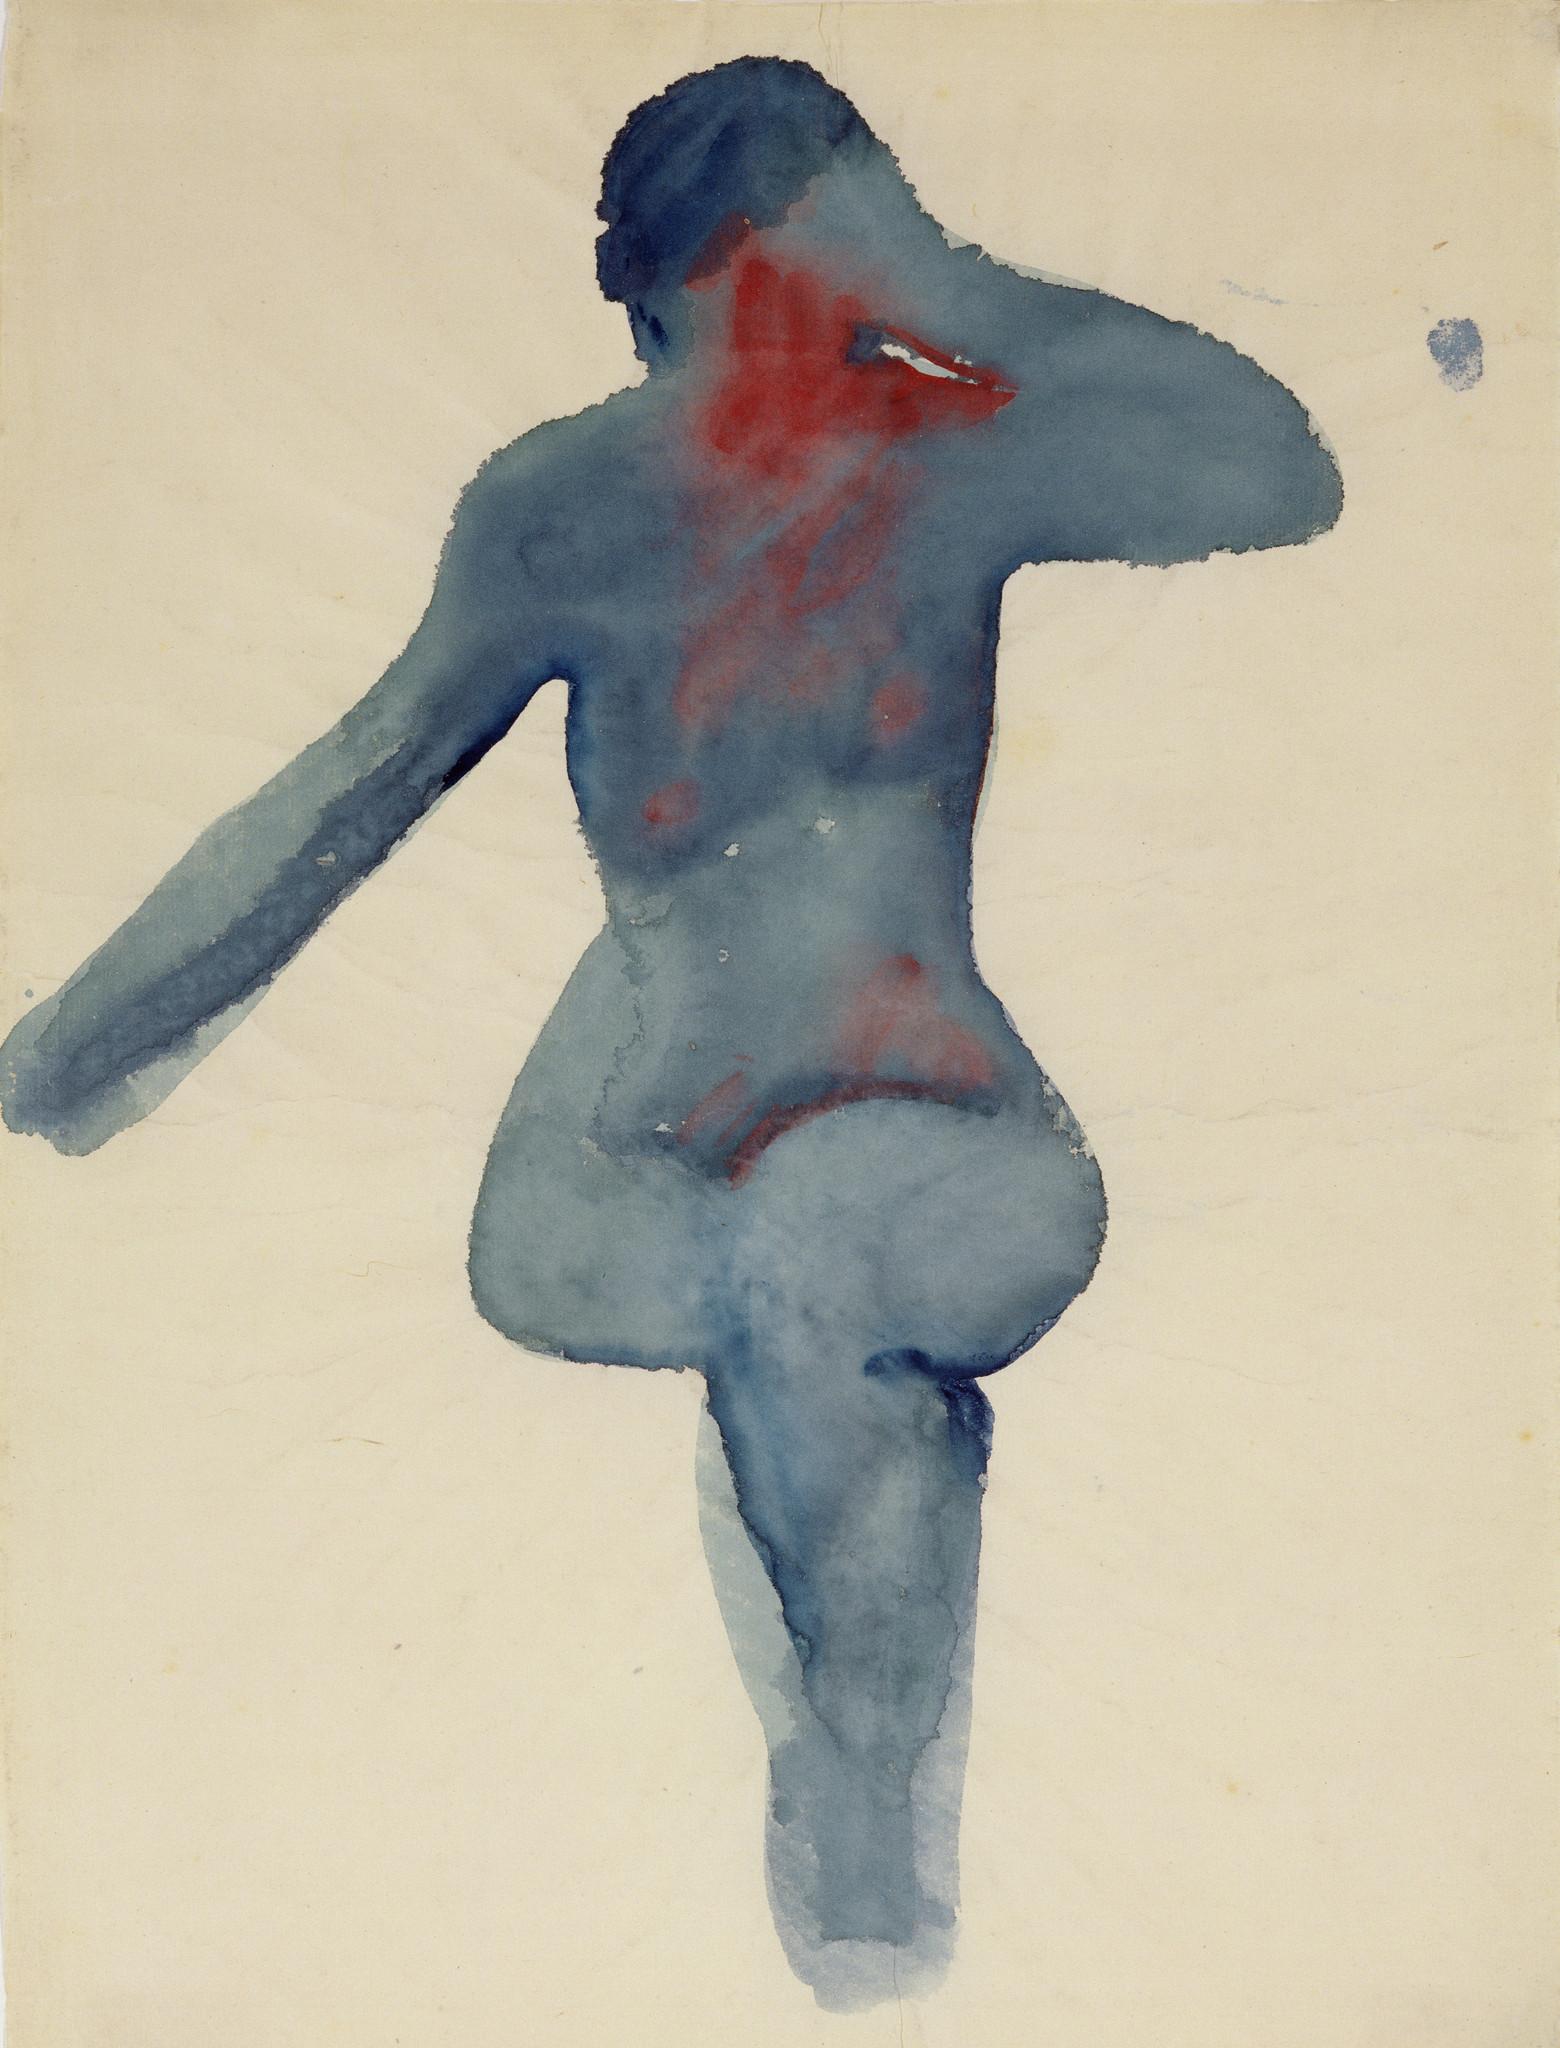 Nude Series 2, Georgia O'Keeffe, 1917